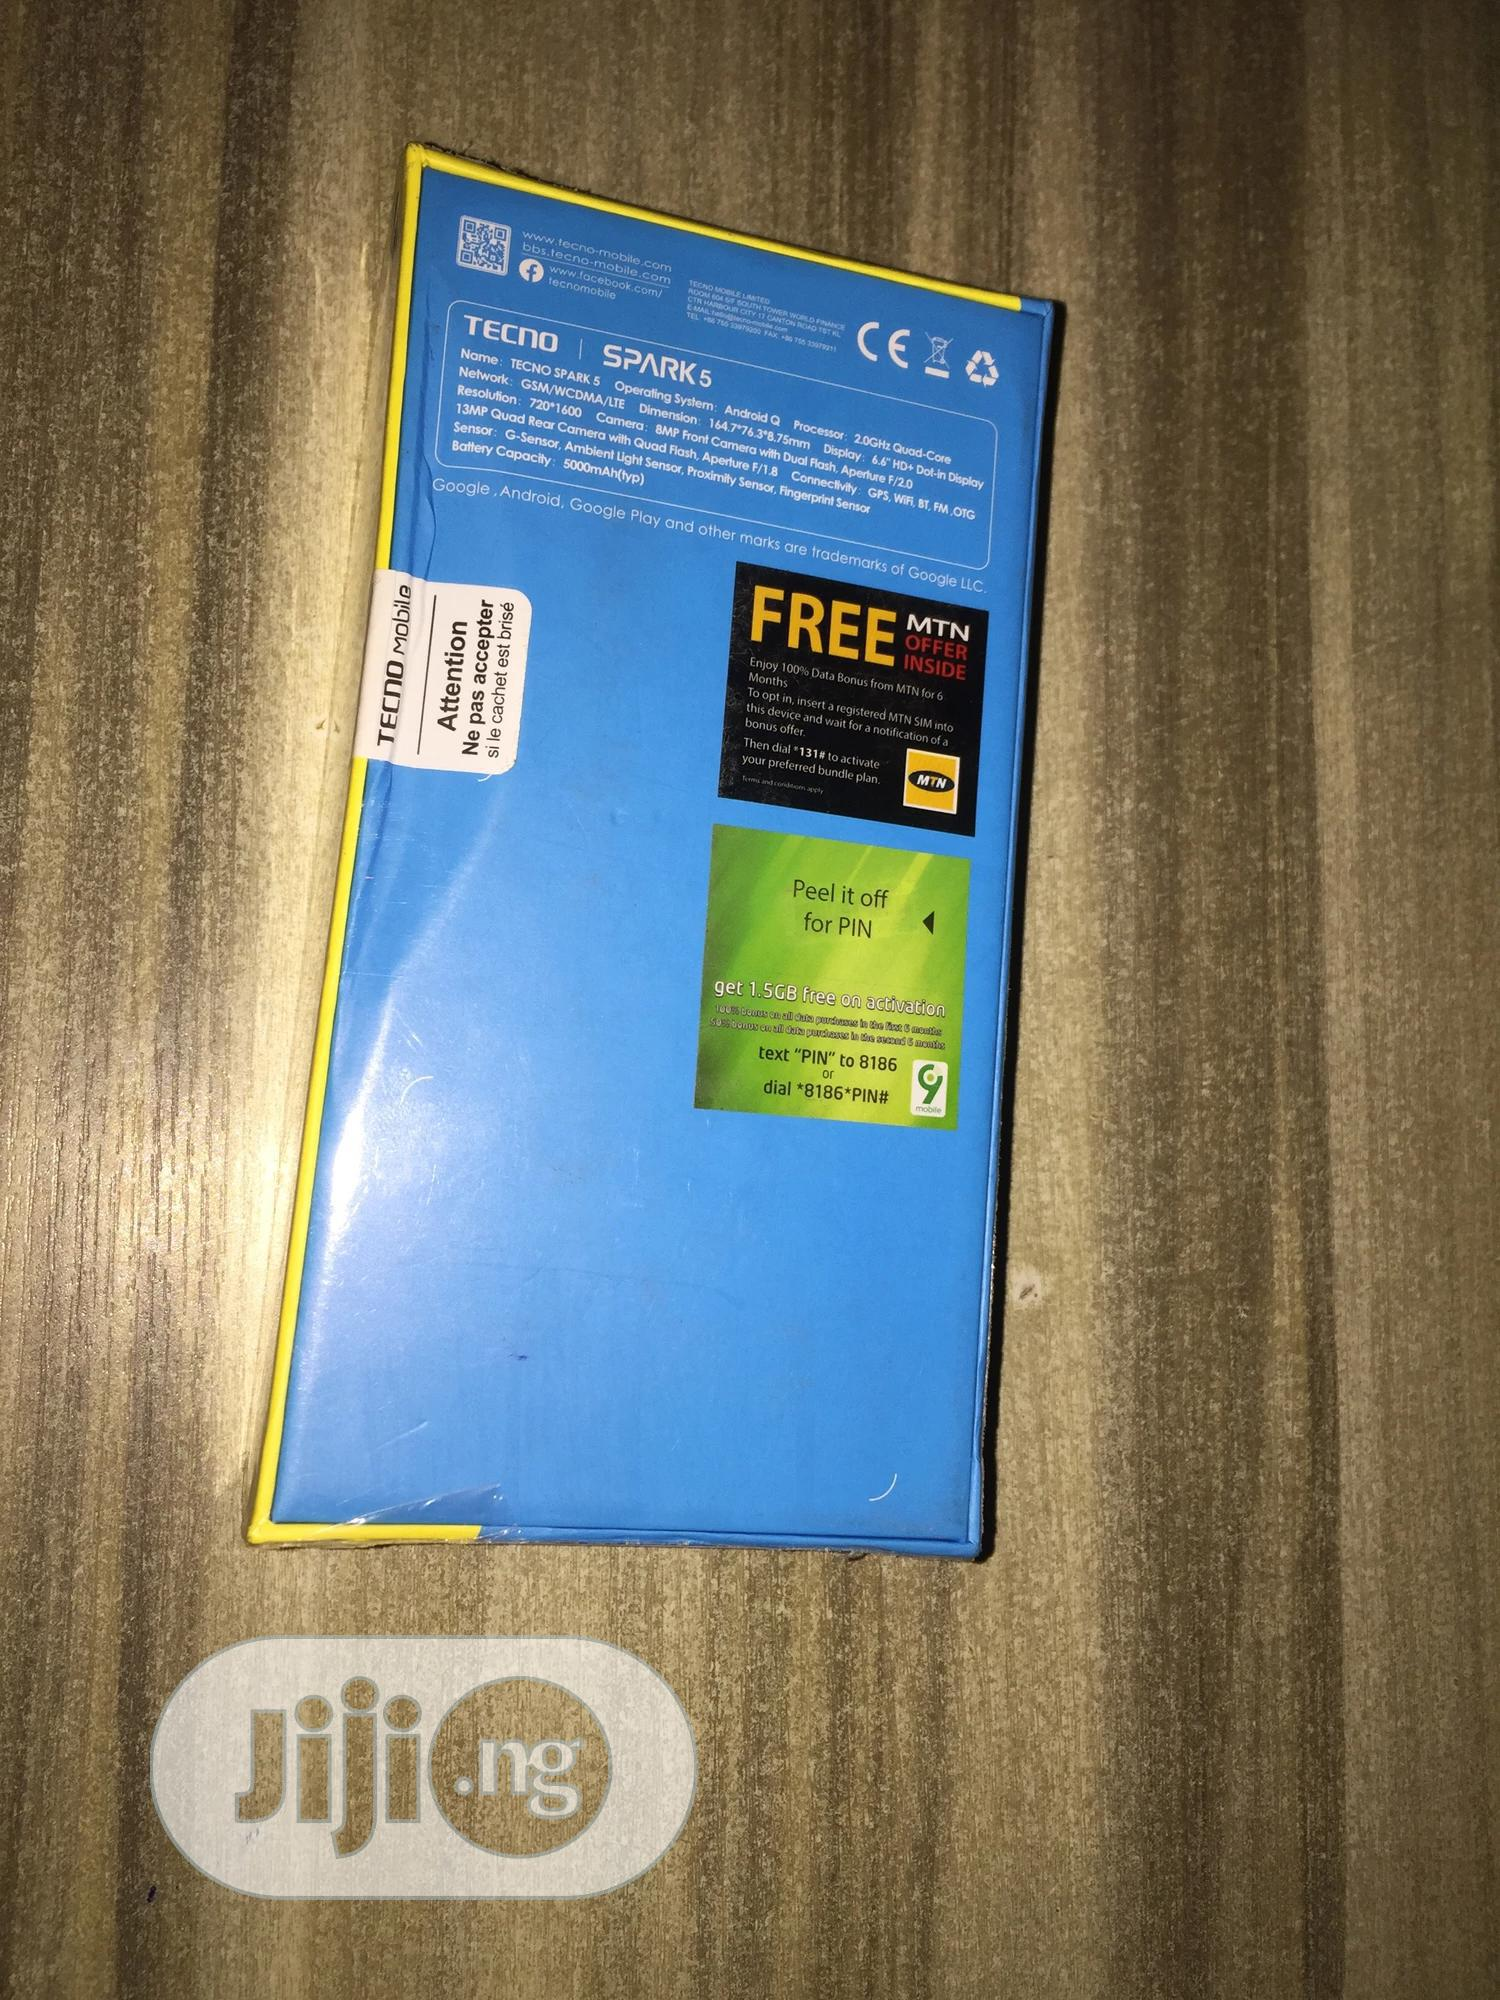 New Tecno Spark 5 32 GB | Mobile Phones for sale in Kubwa, Abuja (FCT) State, Nigeria